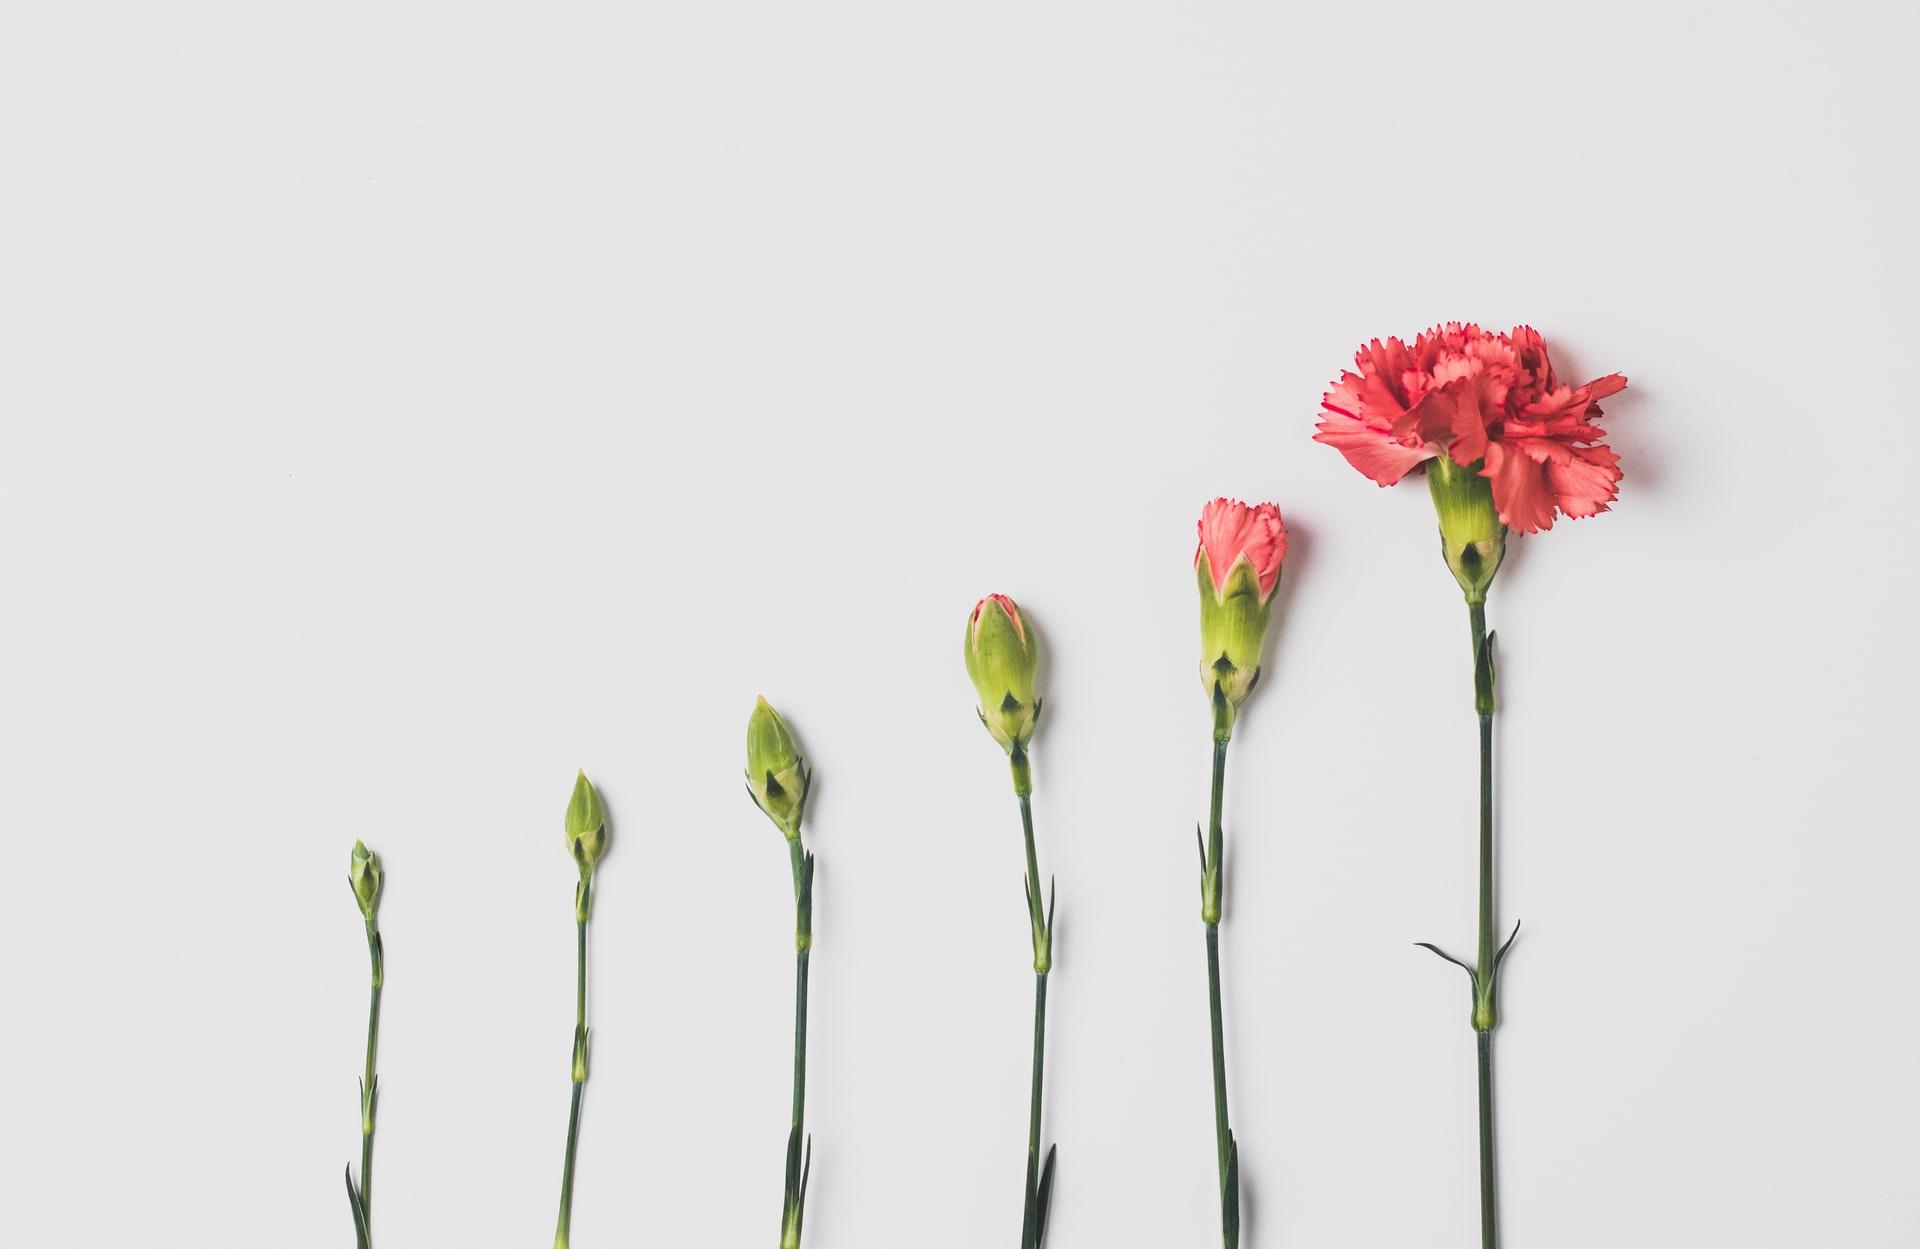 flowers illustrating growth